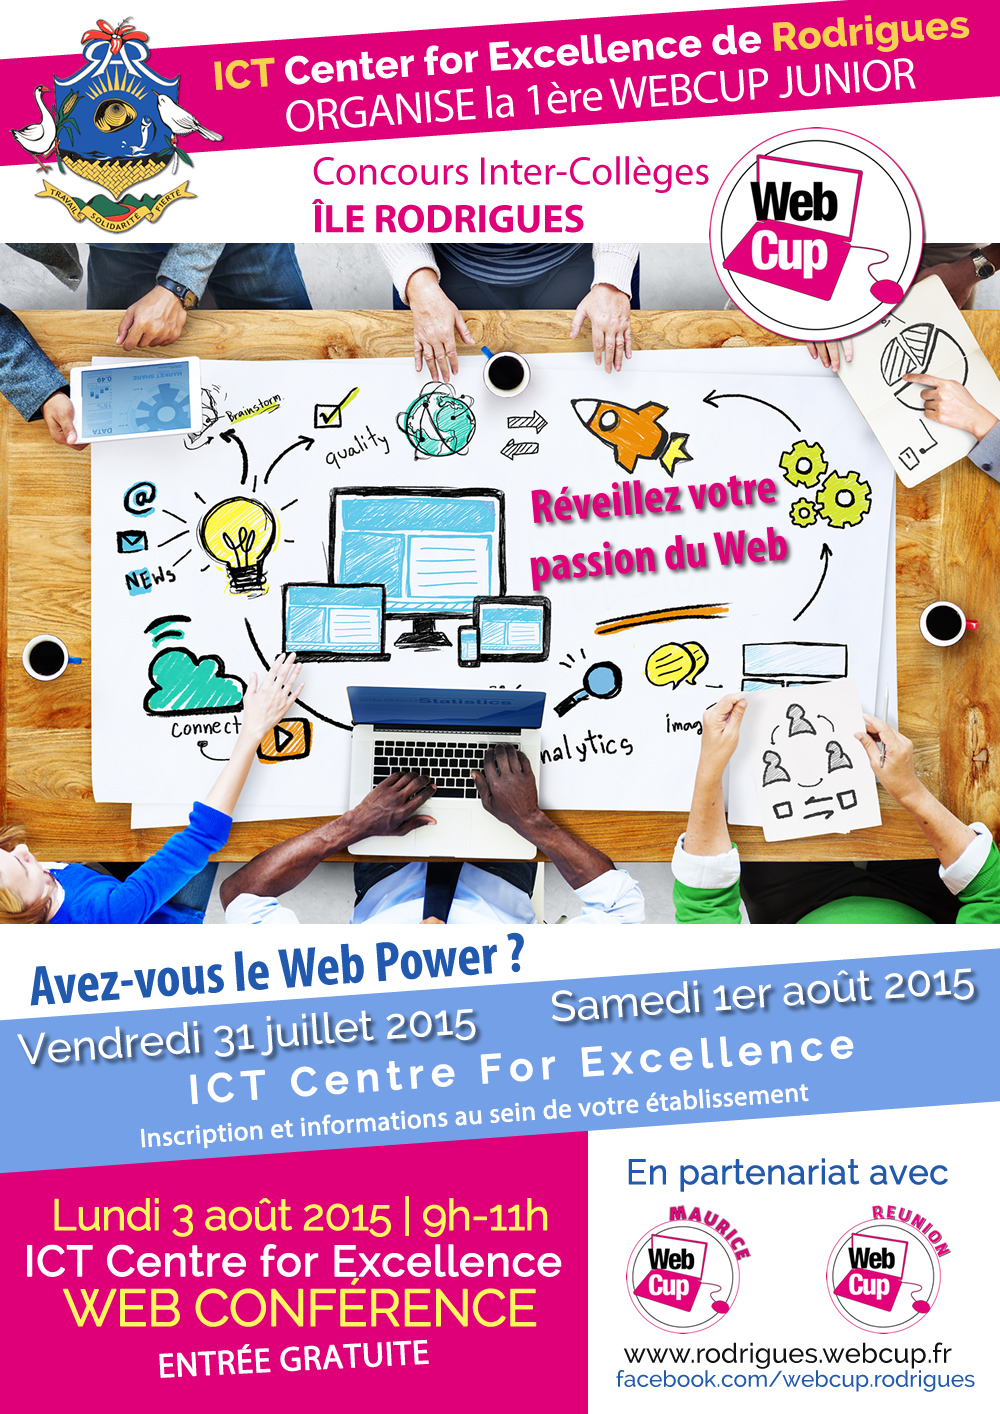 Affiche Webcup Junior Rodrigues